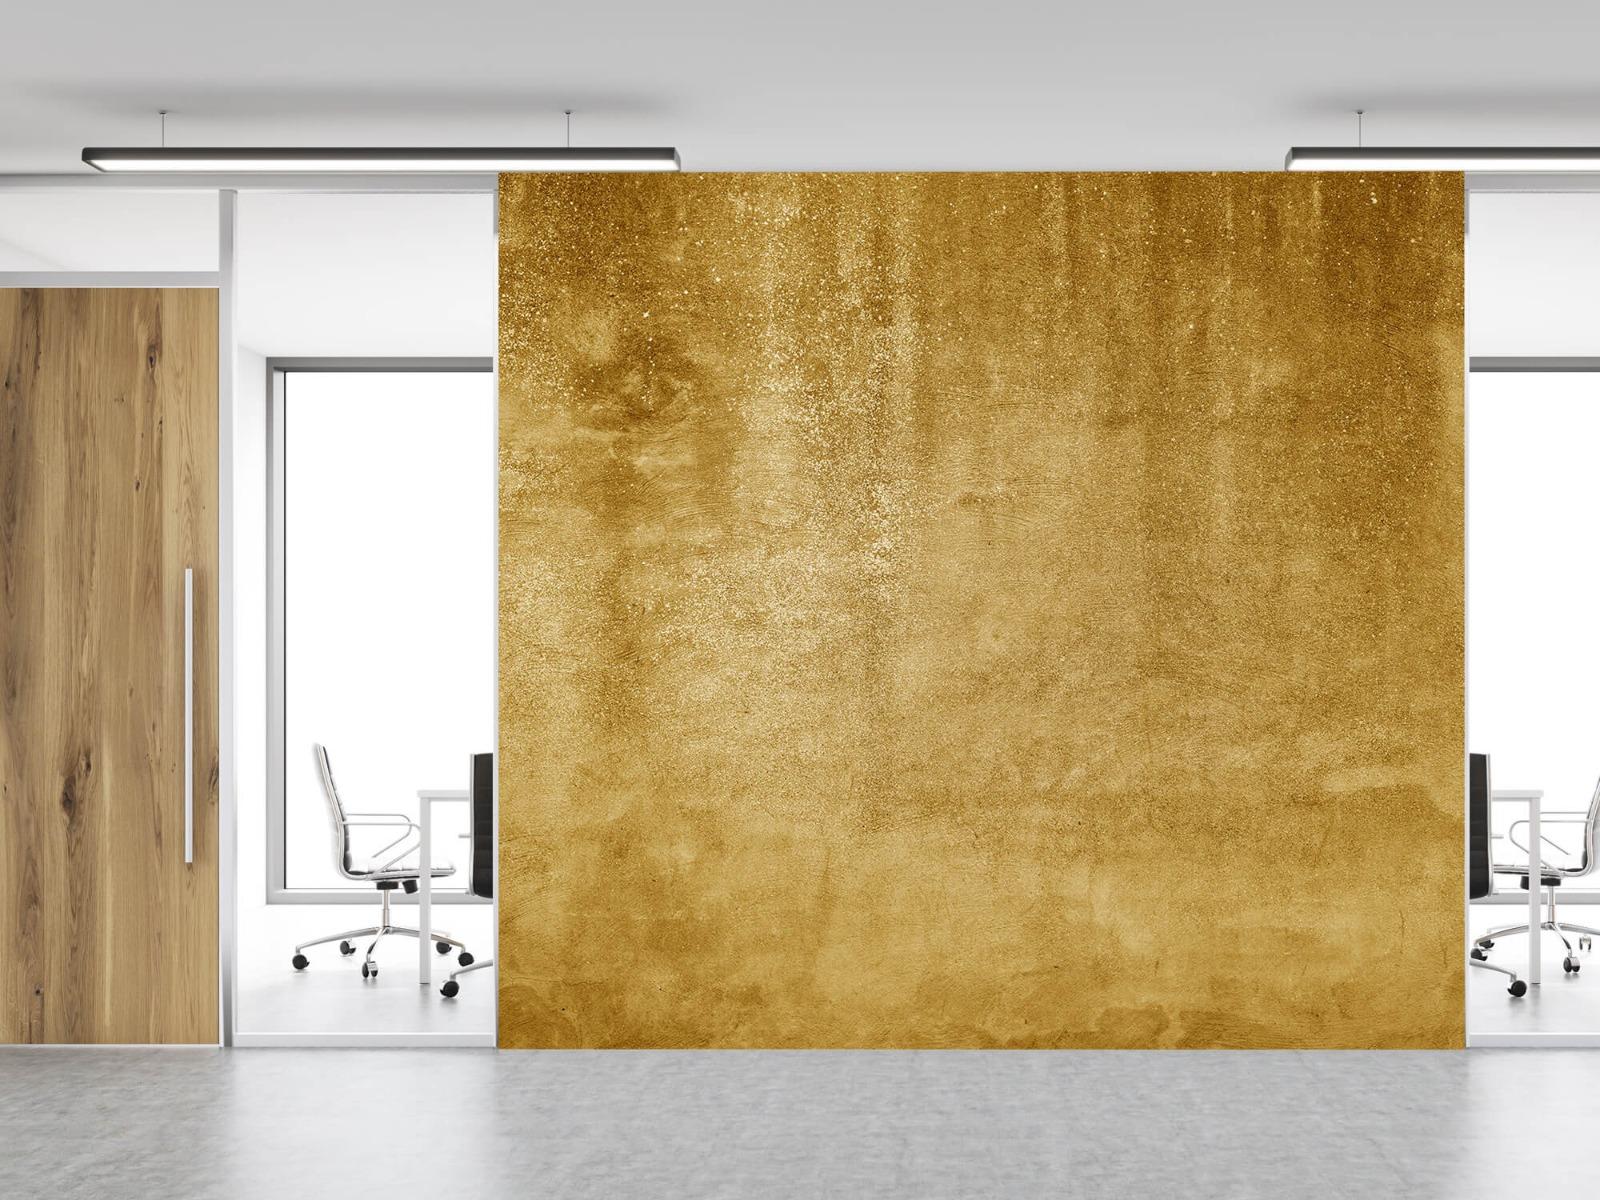 Betonlook behang - Oker geel beton - Woonkamer 12